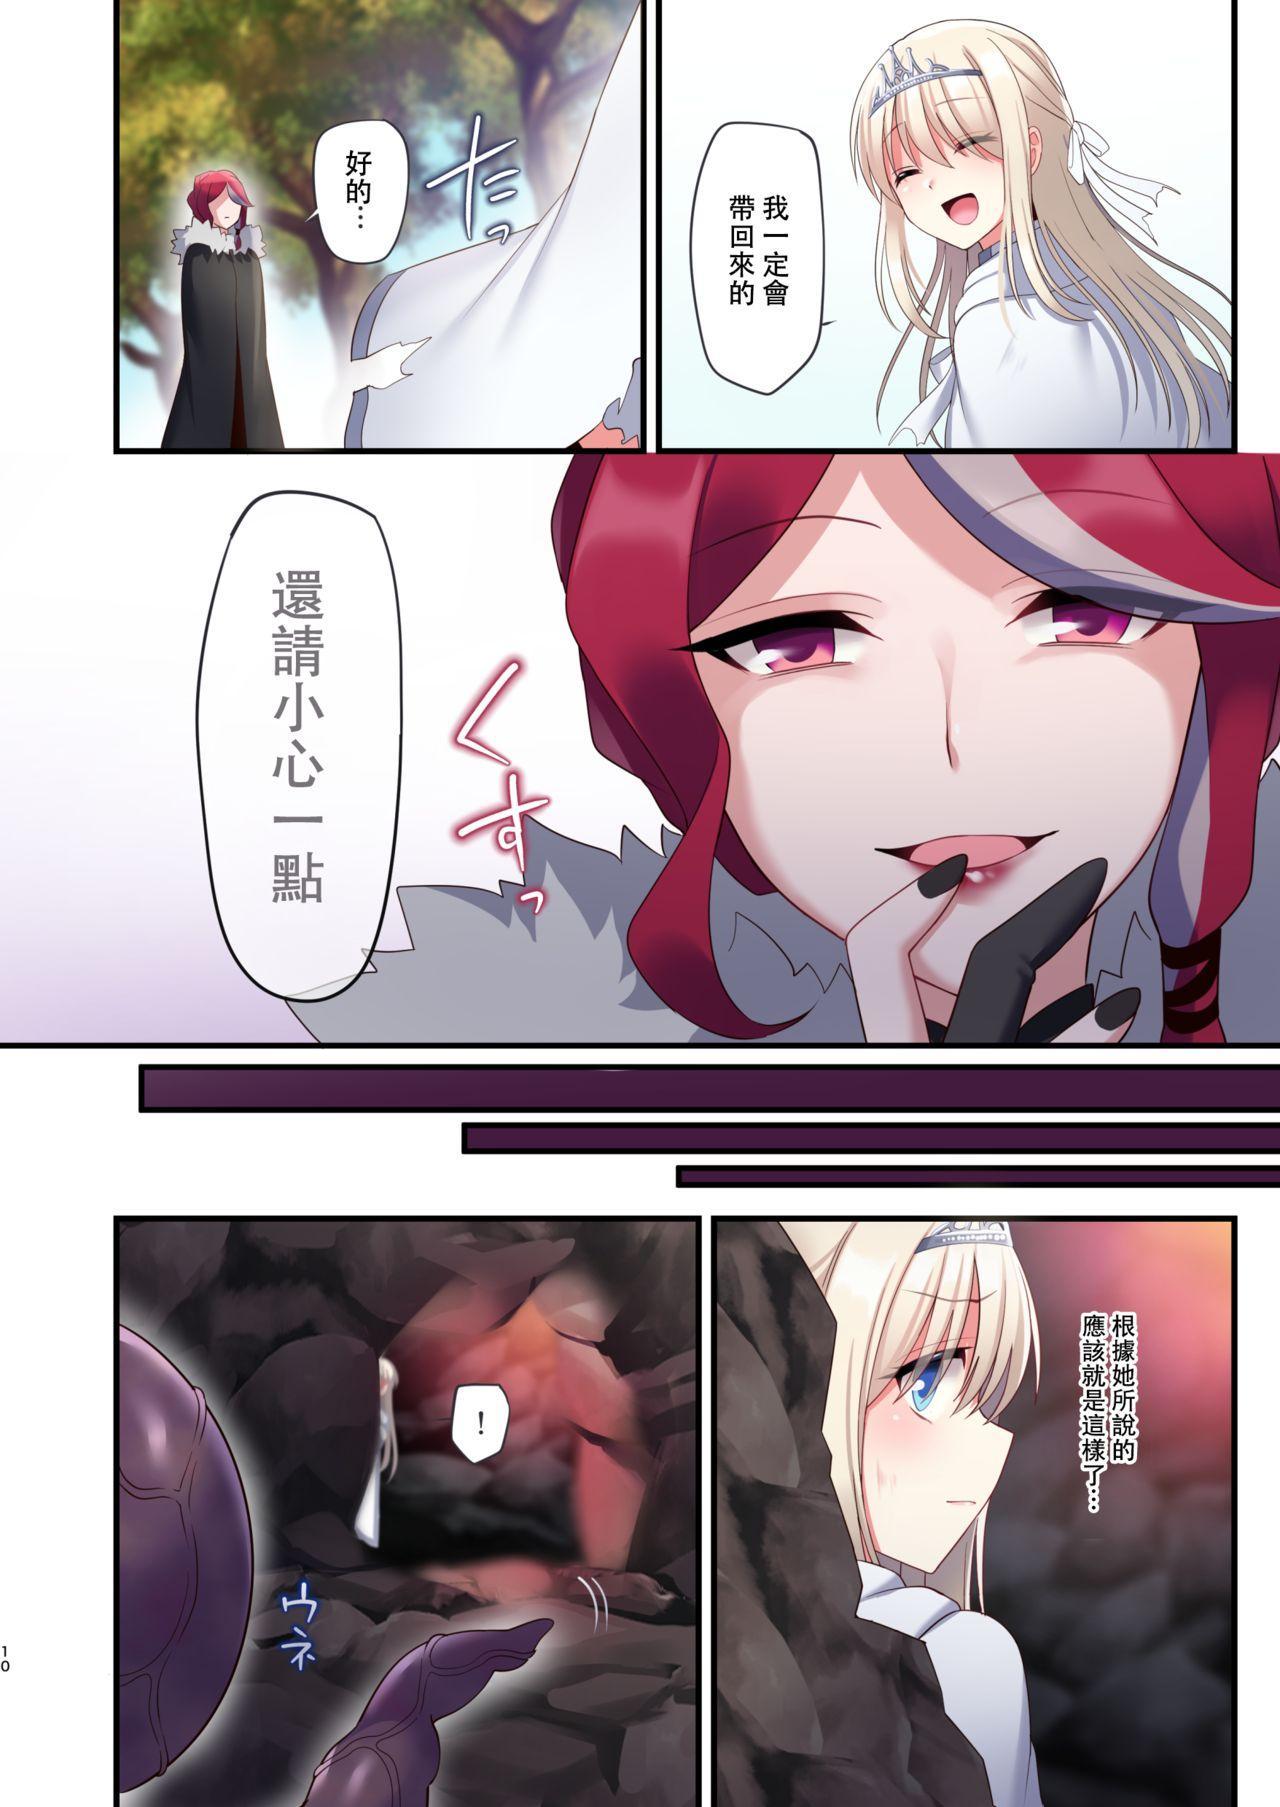 Noroi no Yubiwa de Game Over + Omake CG 10